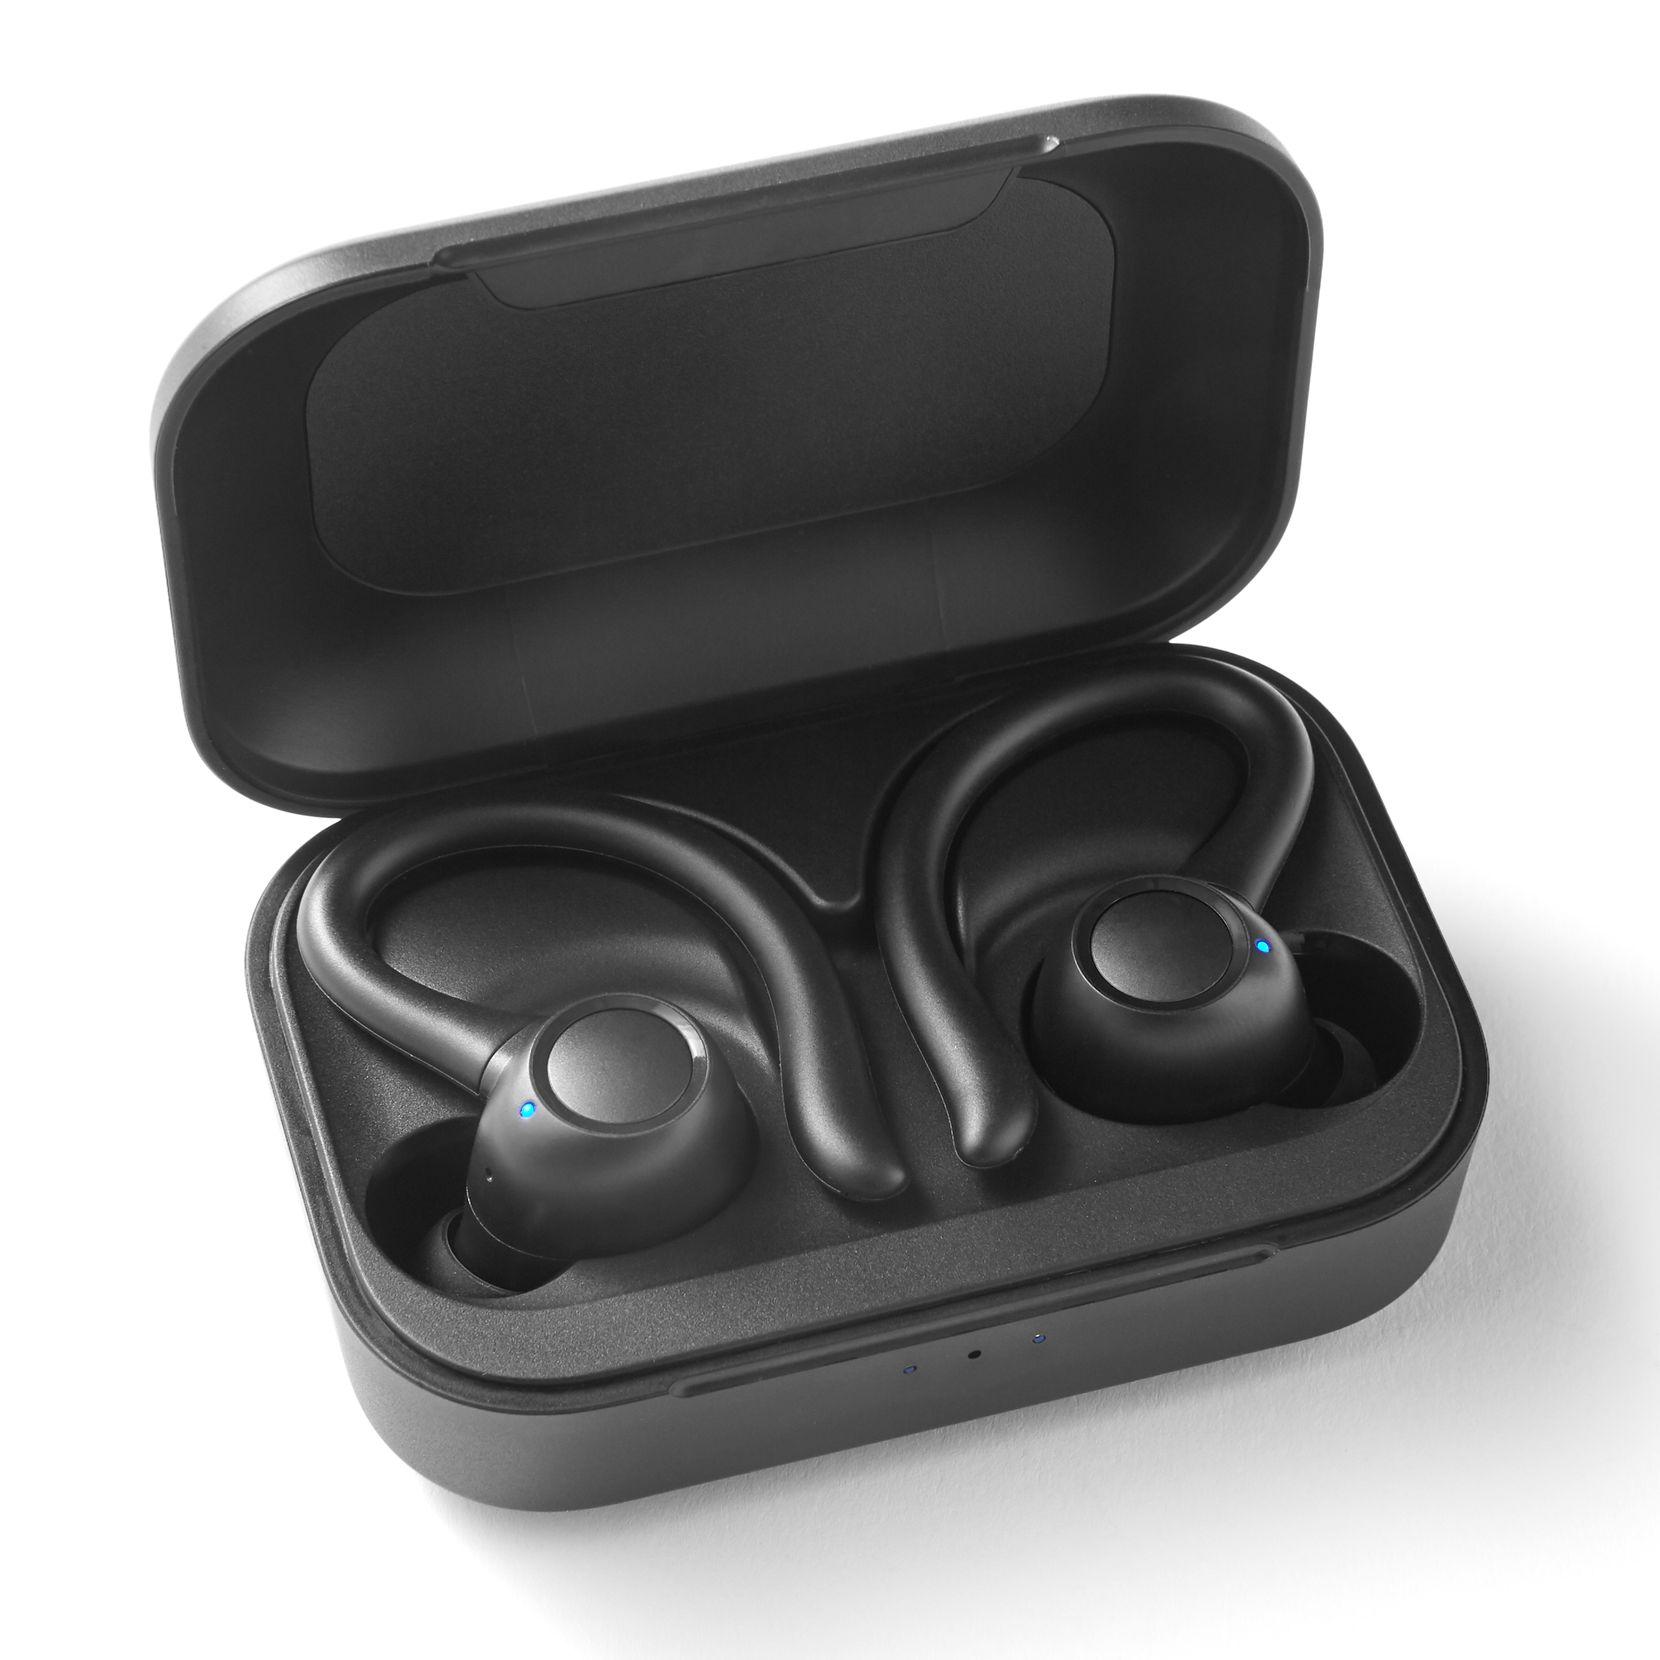 The Blackweb True Wireless Bluetooth Earbuds